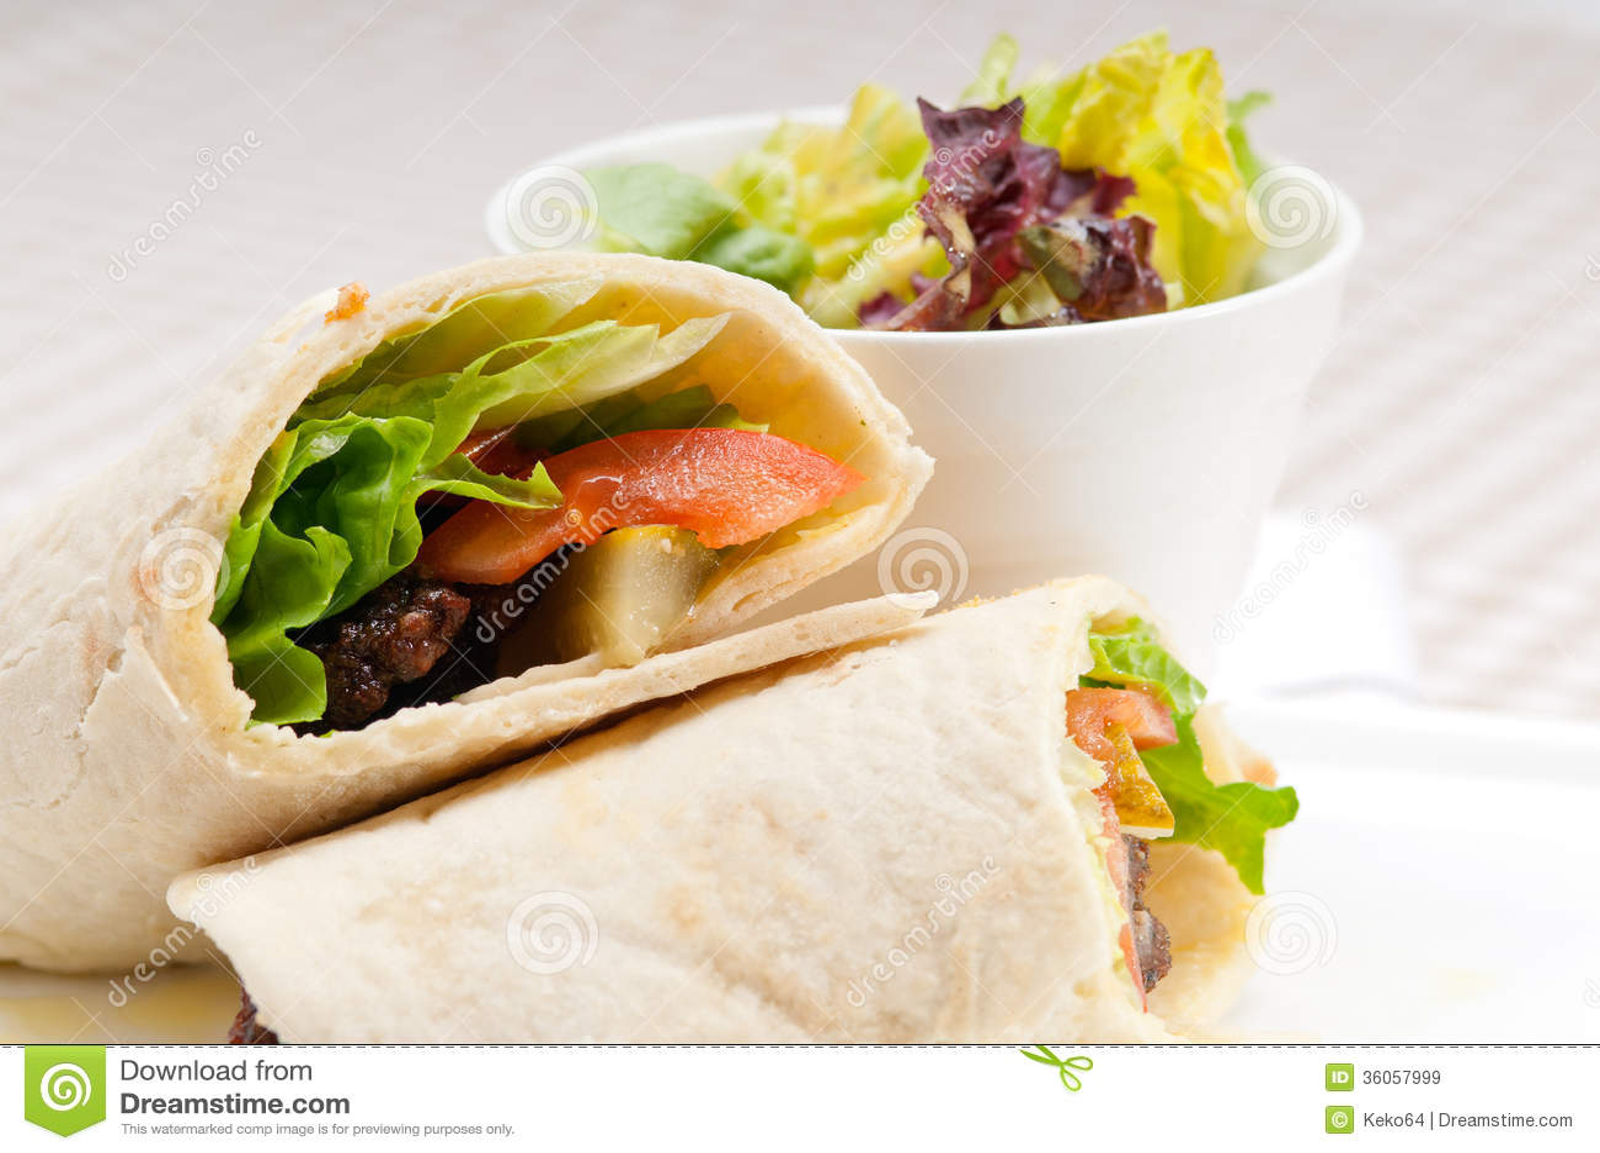 kafta shawarma chicken pita wrap roll sandwich royalty